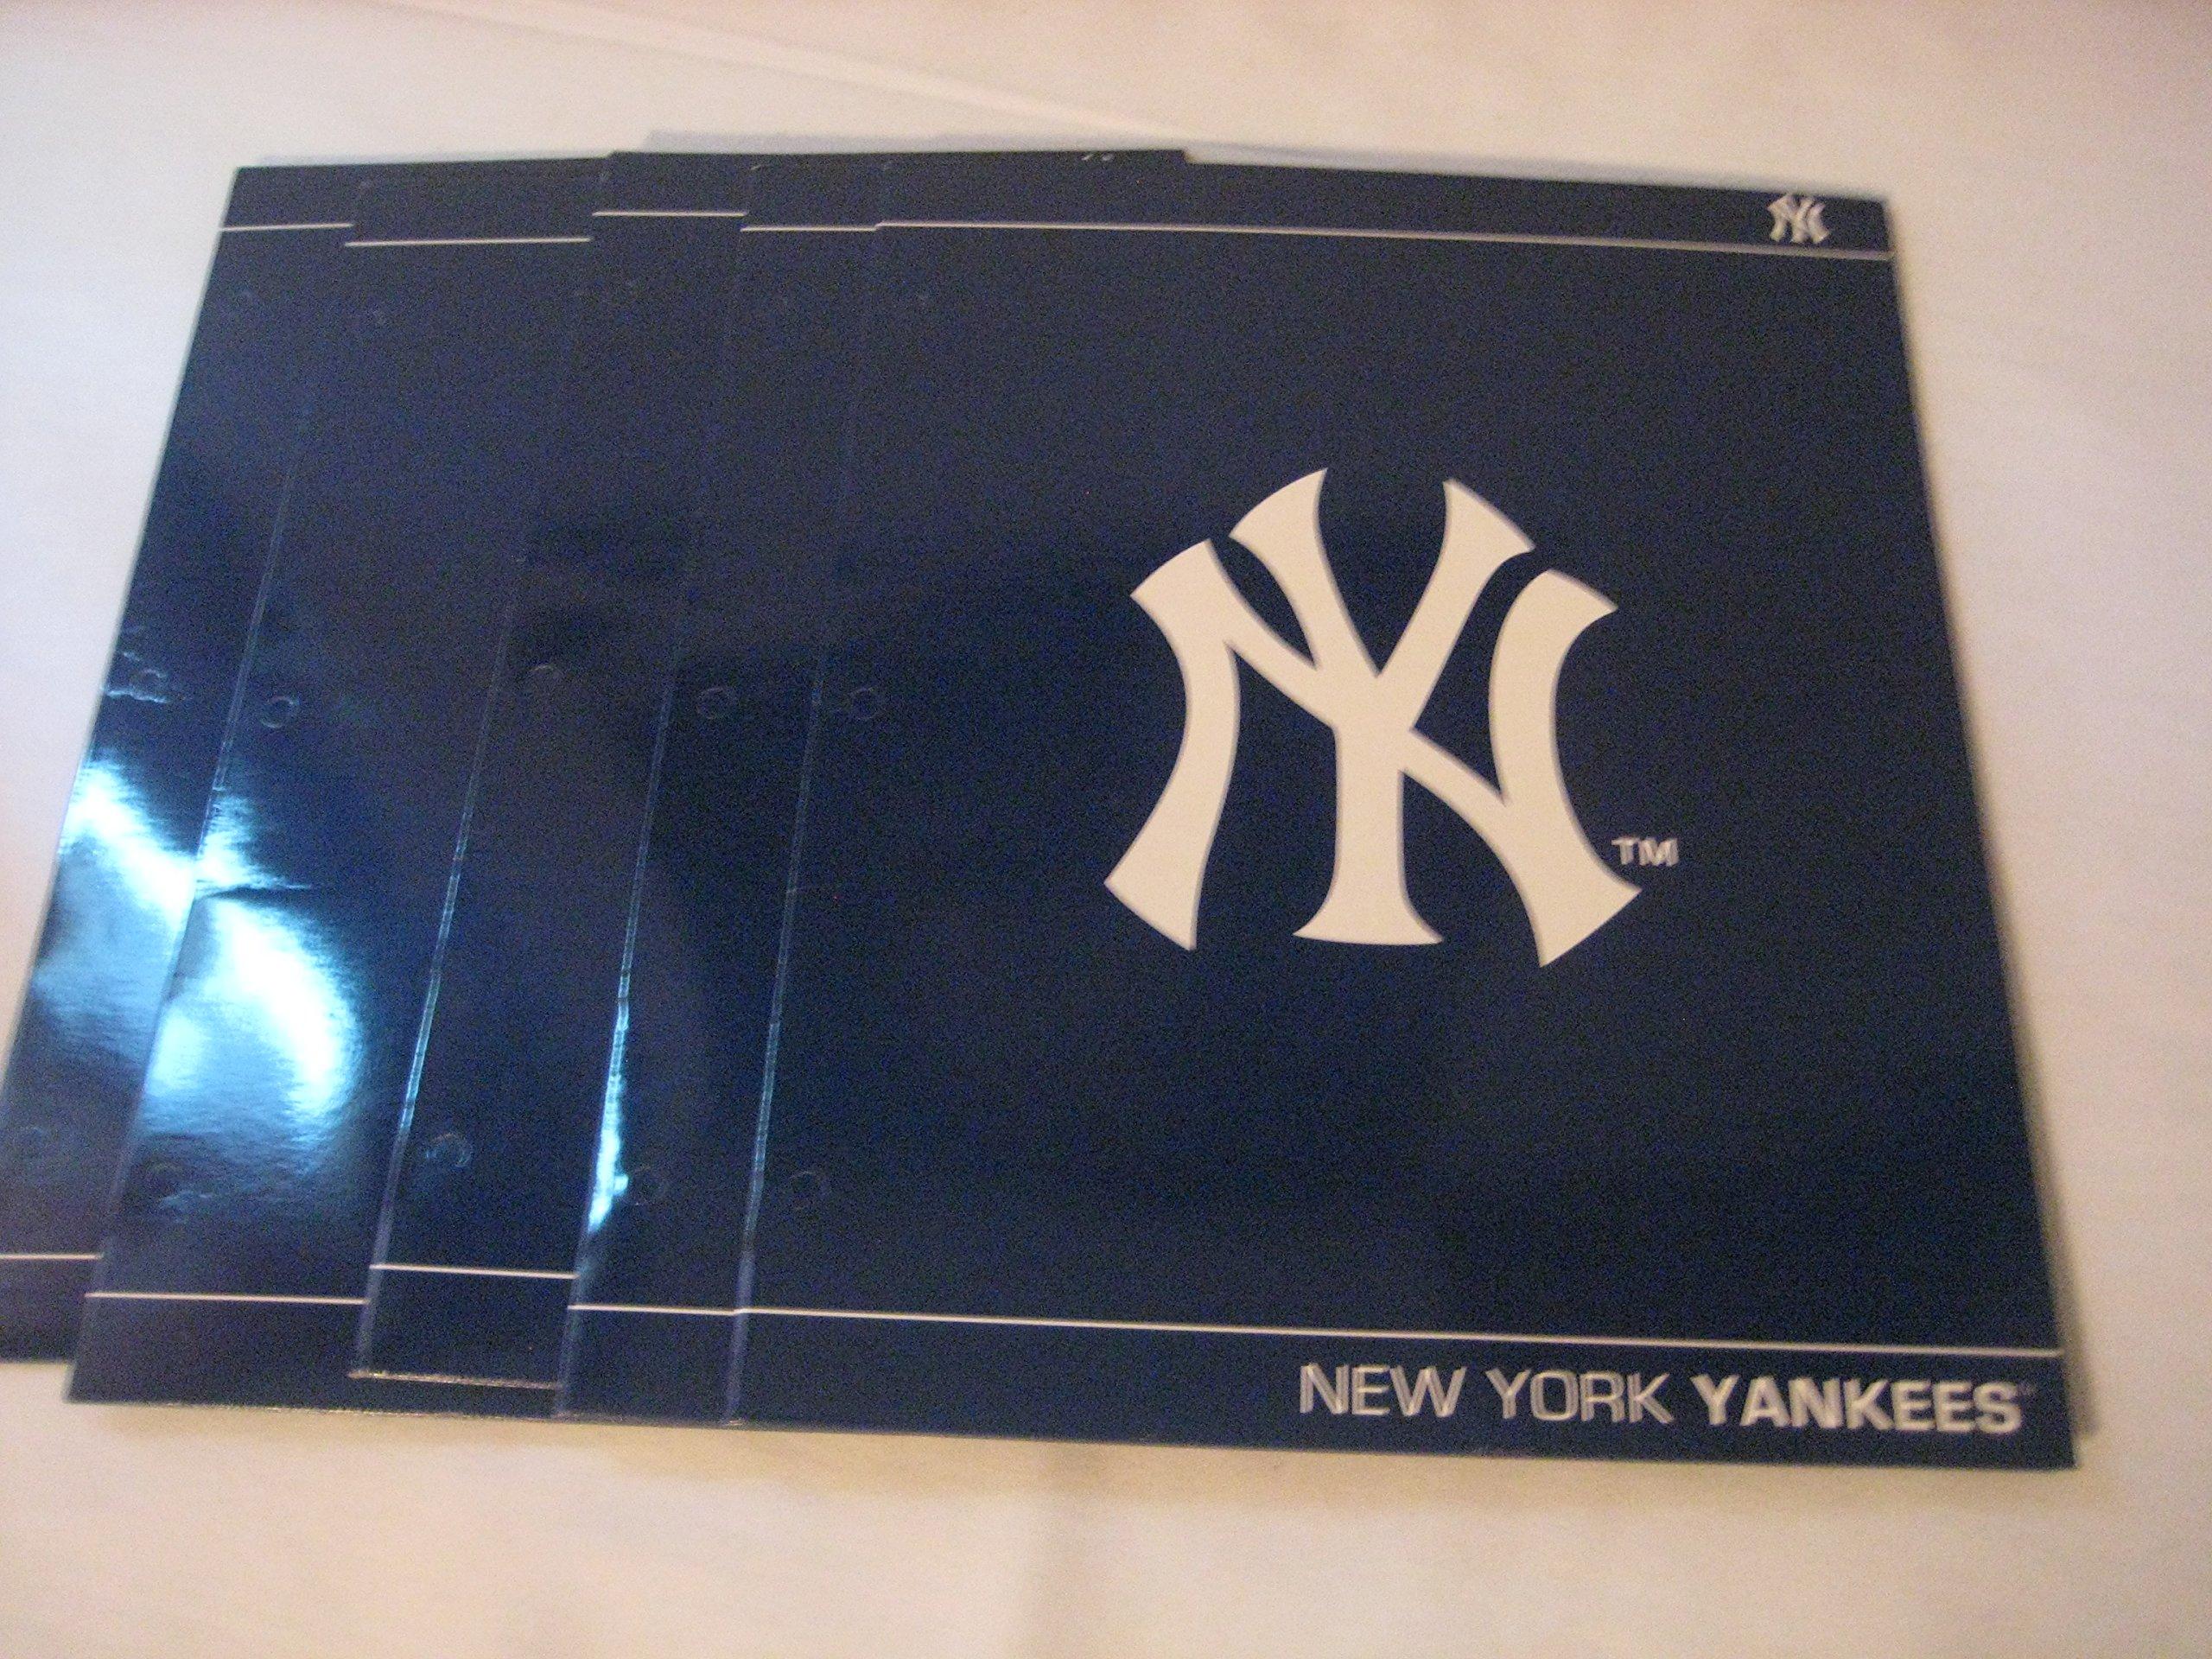 New York Yankee Folders (5 pack)